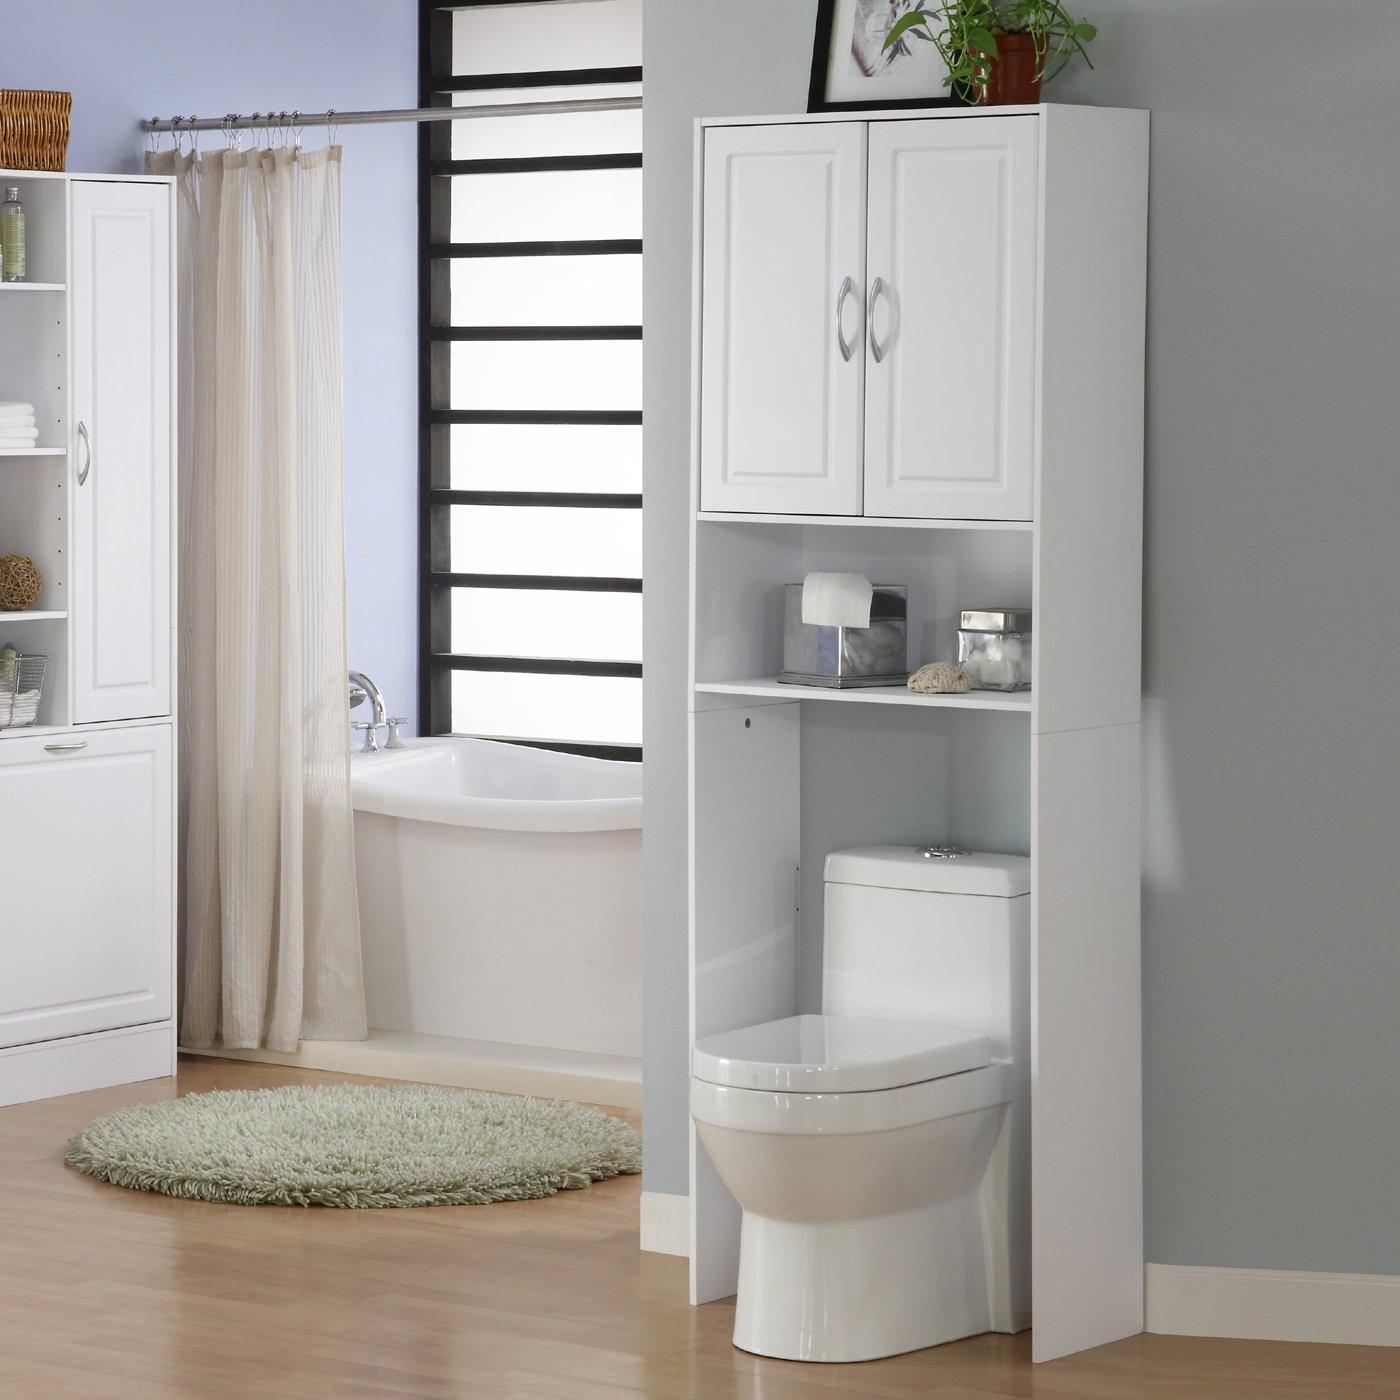 Bathroom Shelves Over toilet Cute Bathroom Bathroom Space Saver Pattern